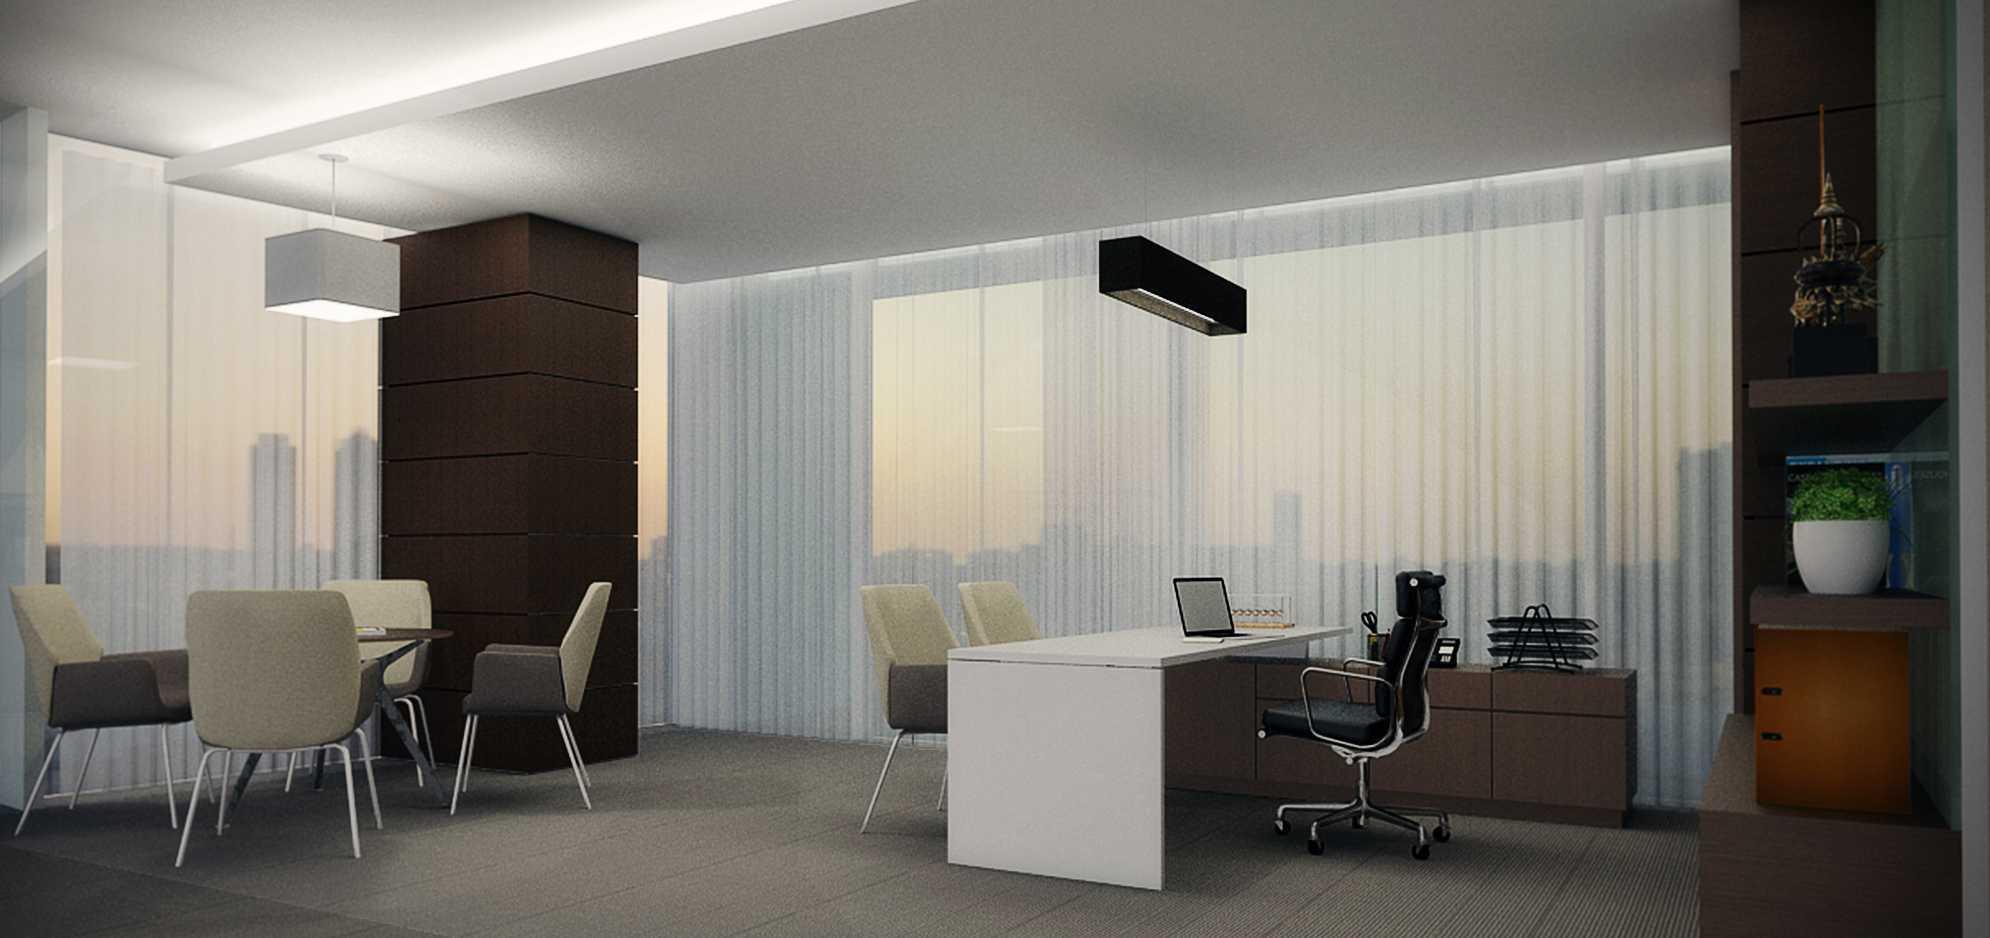 Pt. Garisprada Petrosea Bintaro Bintaro Director Room Modern  25705